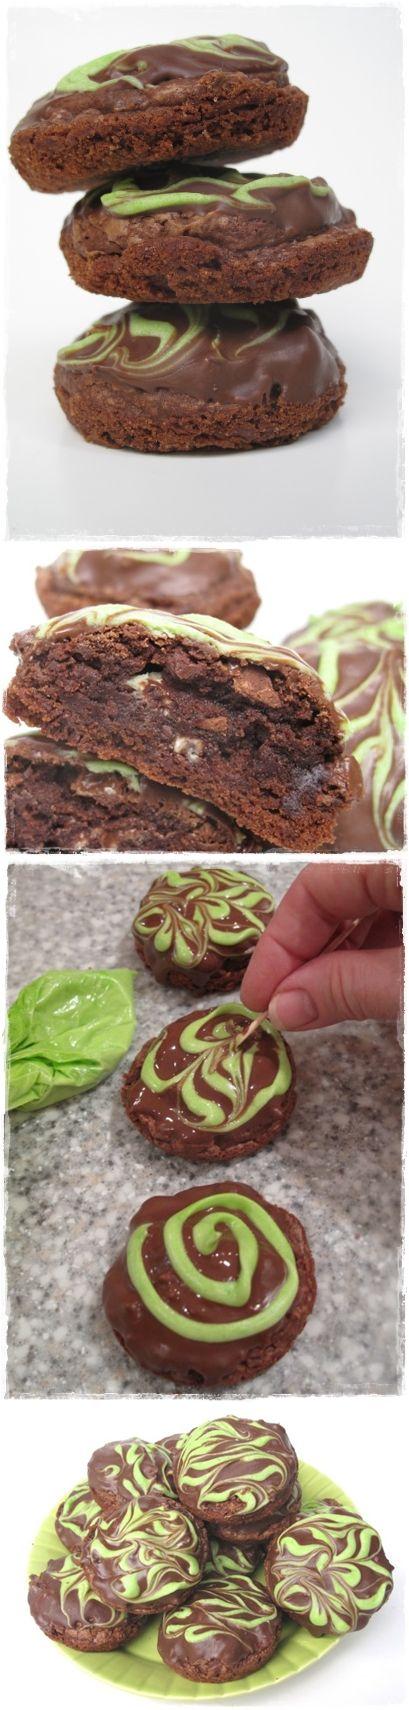 Chocolate Mint Truffle Brownie Bites